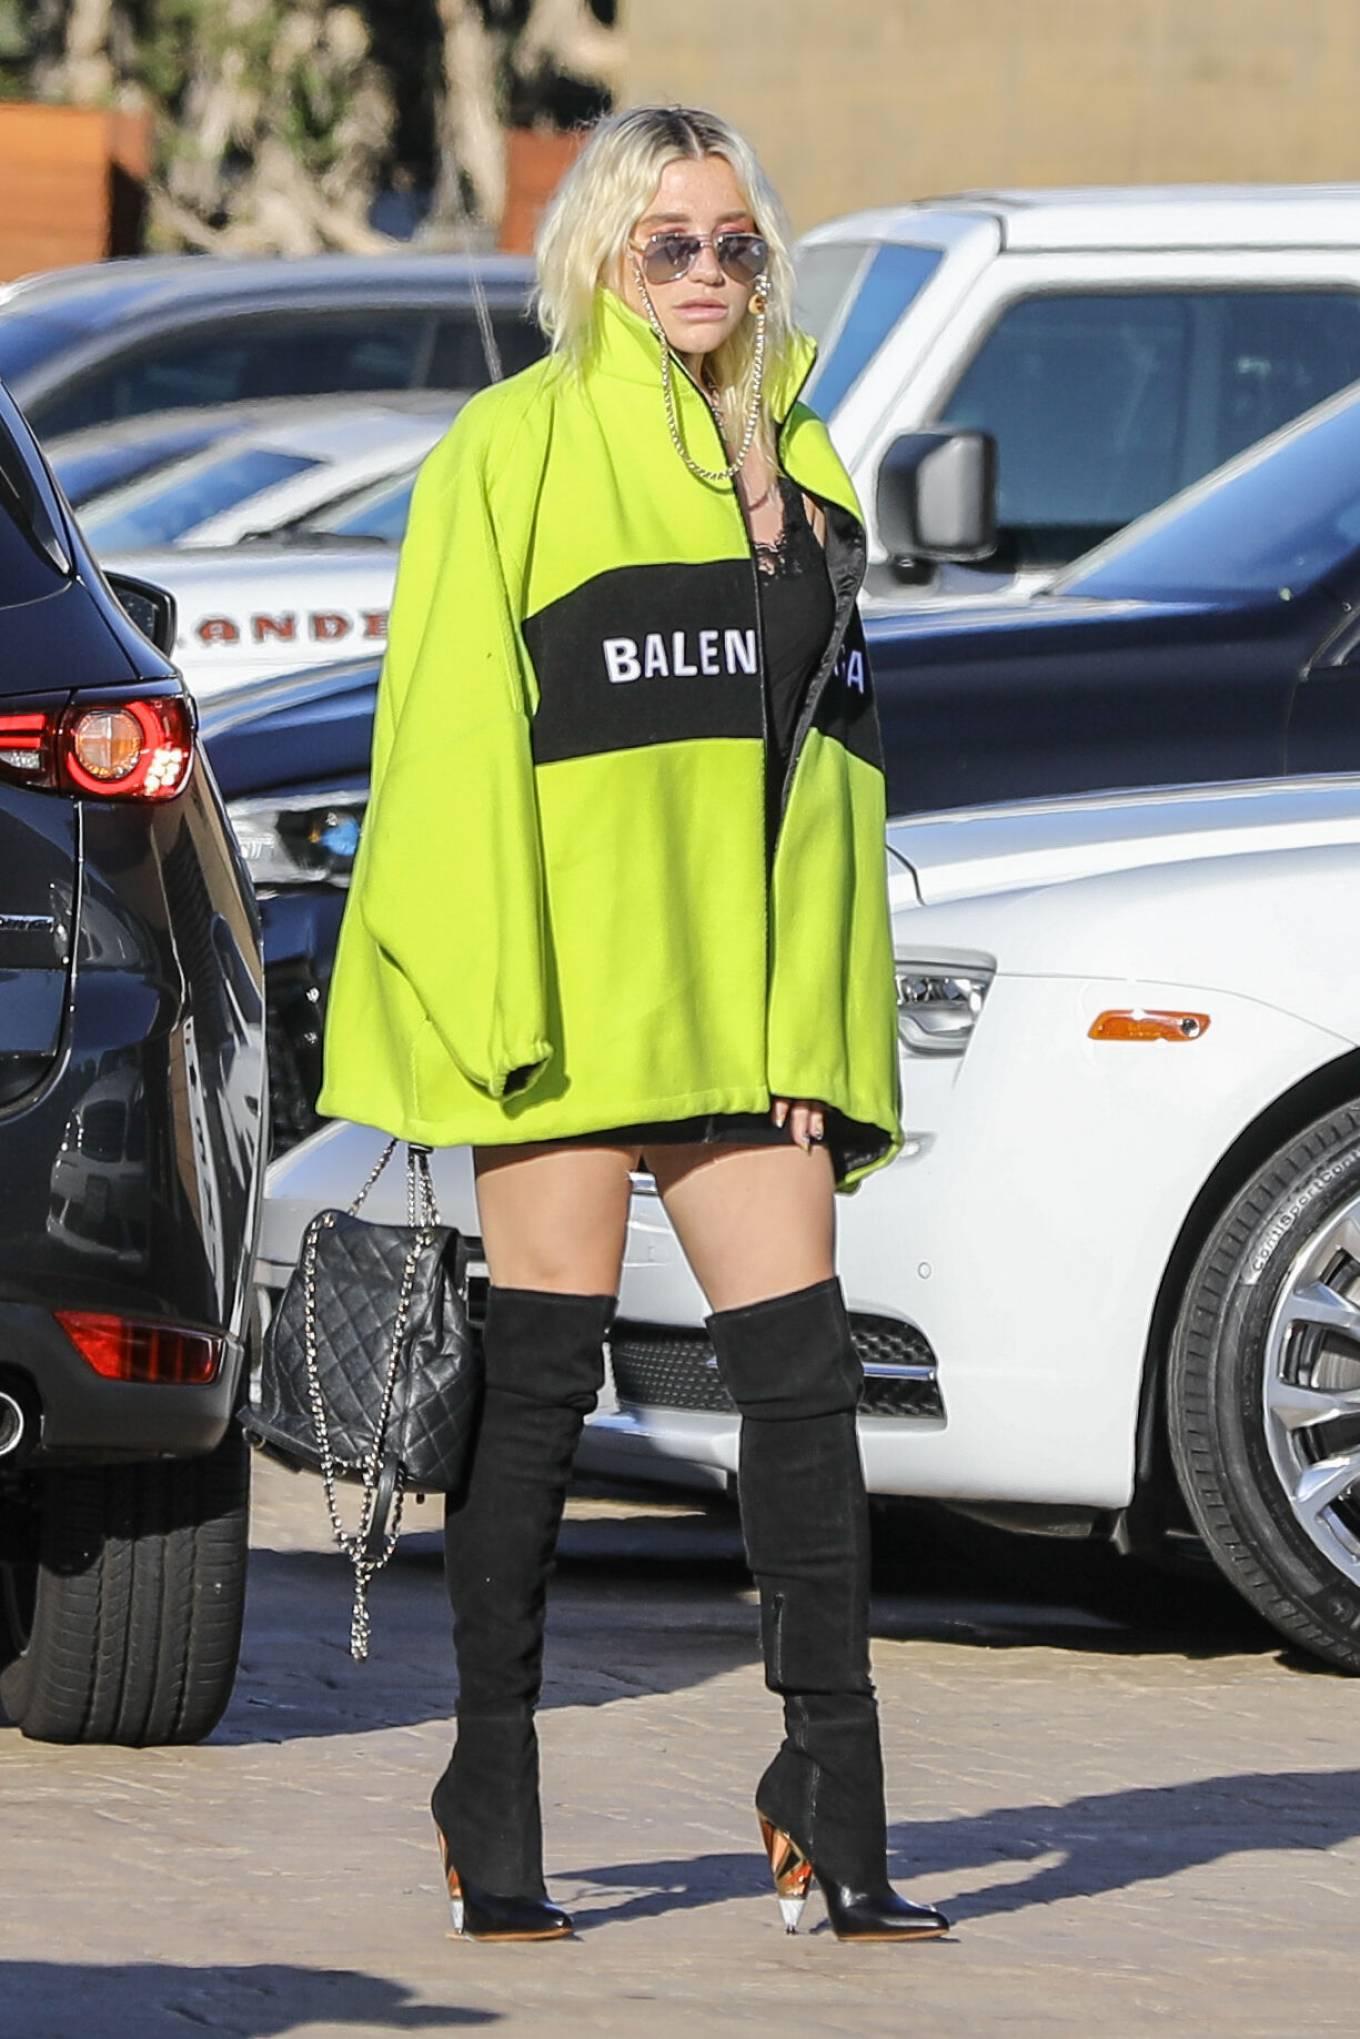 Kesha - Out in Malibu with yellow Belenciaga jacket, high socks and high heels